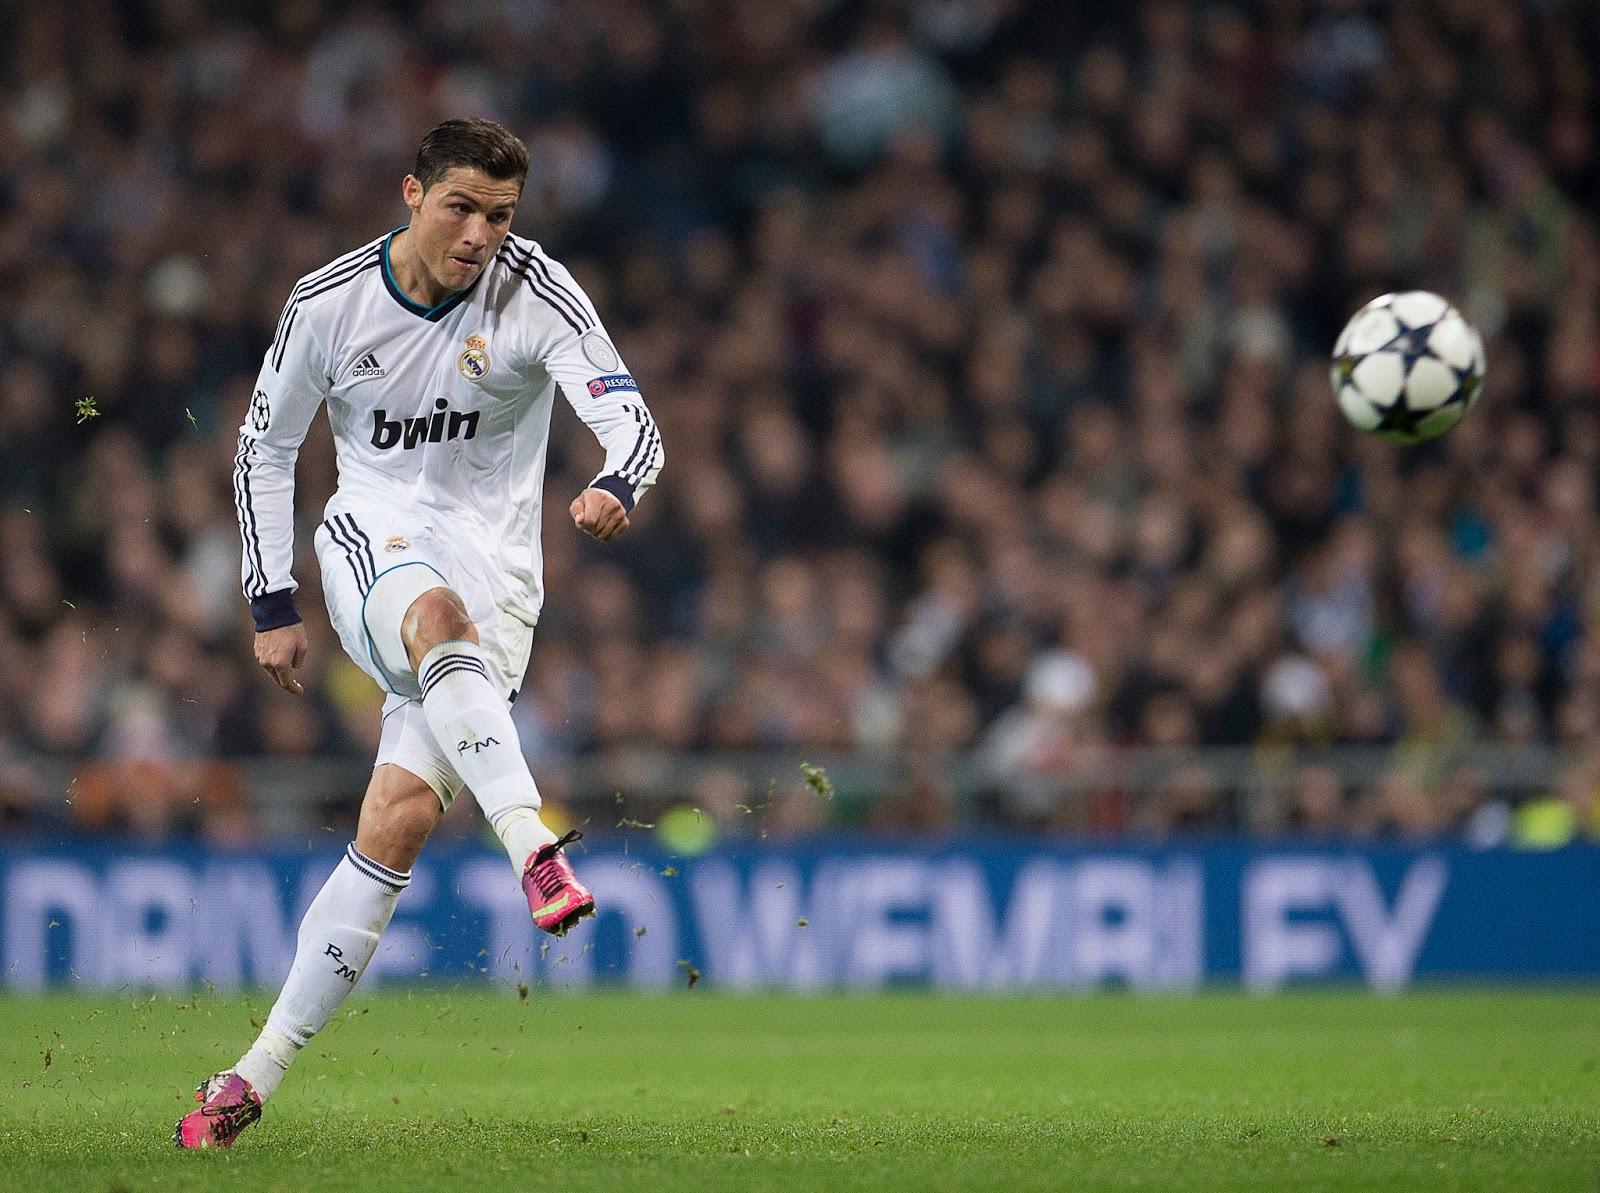 Football Wallpaper - Cristiano Ronaldo free kick picture HD